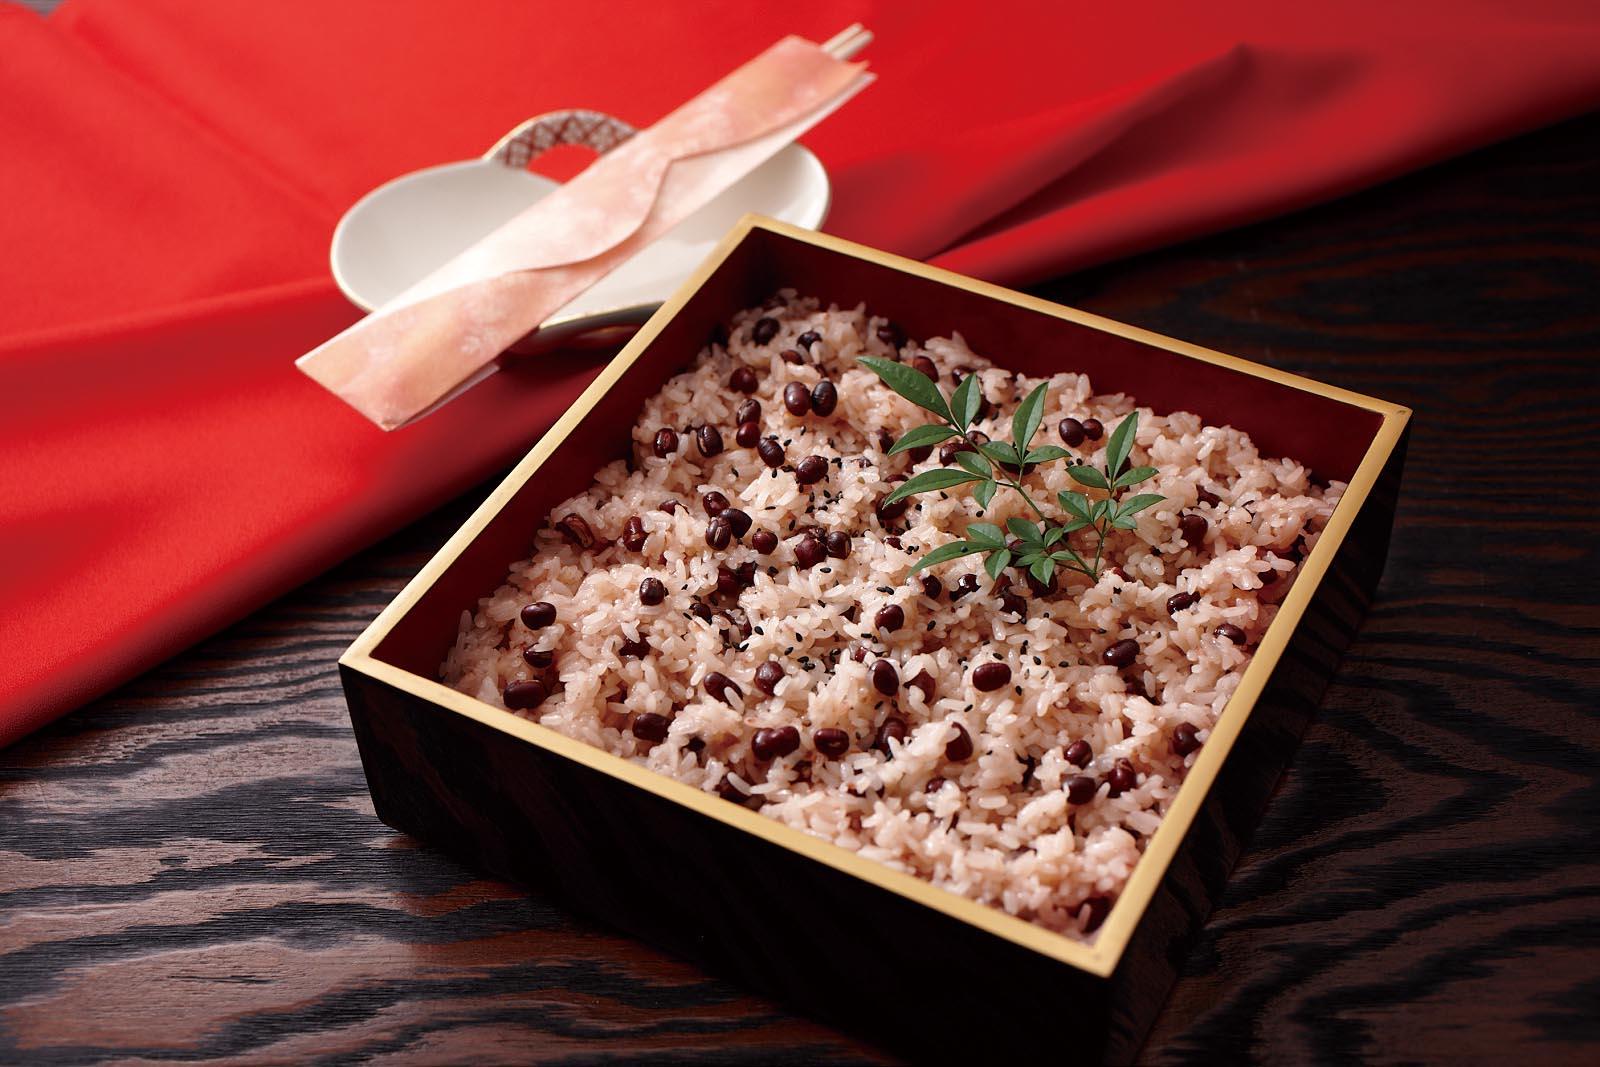 Sekihan - 赤飯 - Japanese Sticky Rice With Azuki Beans